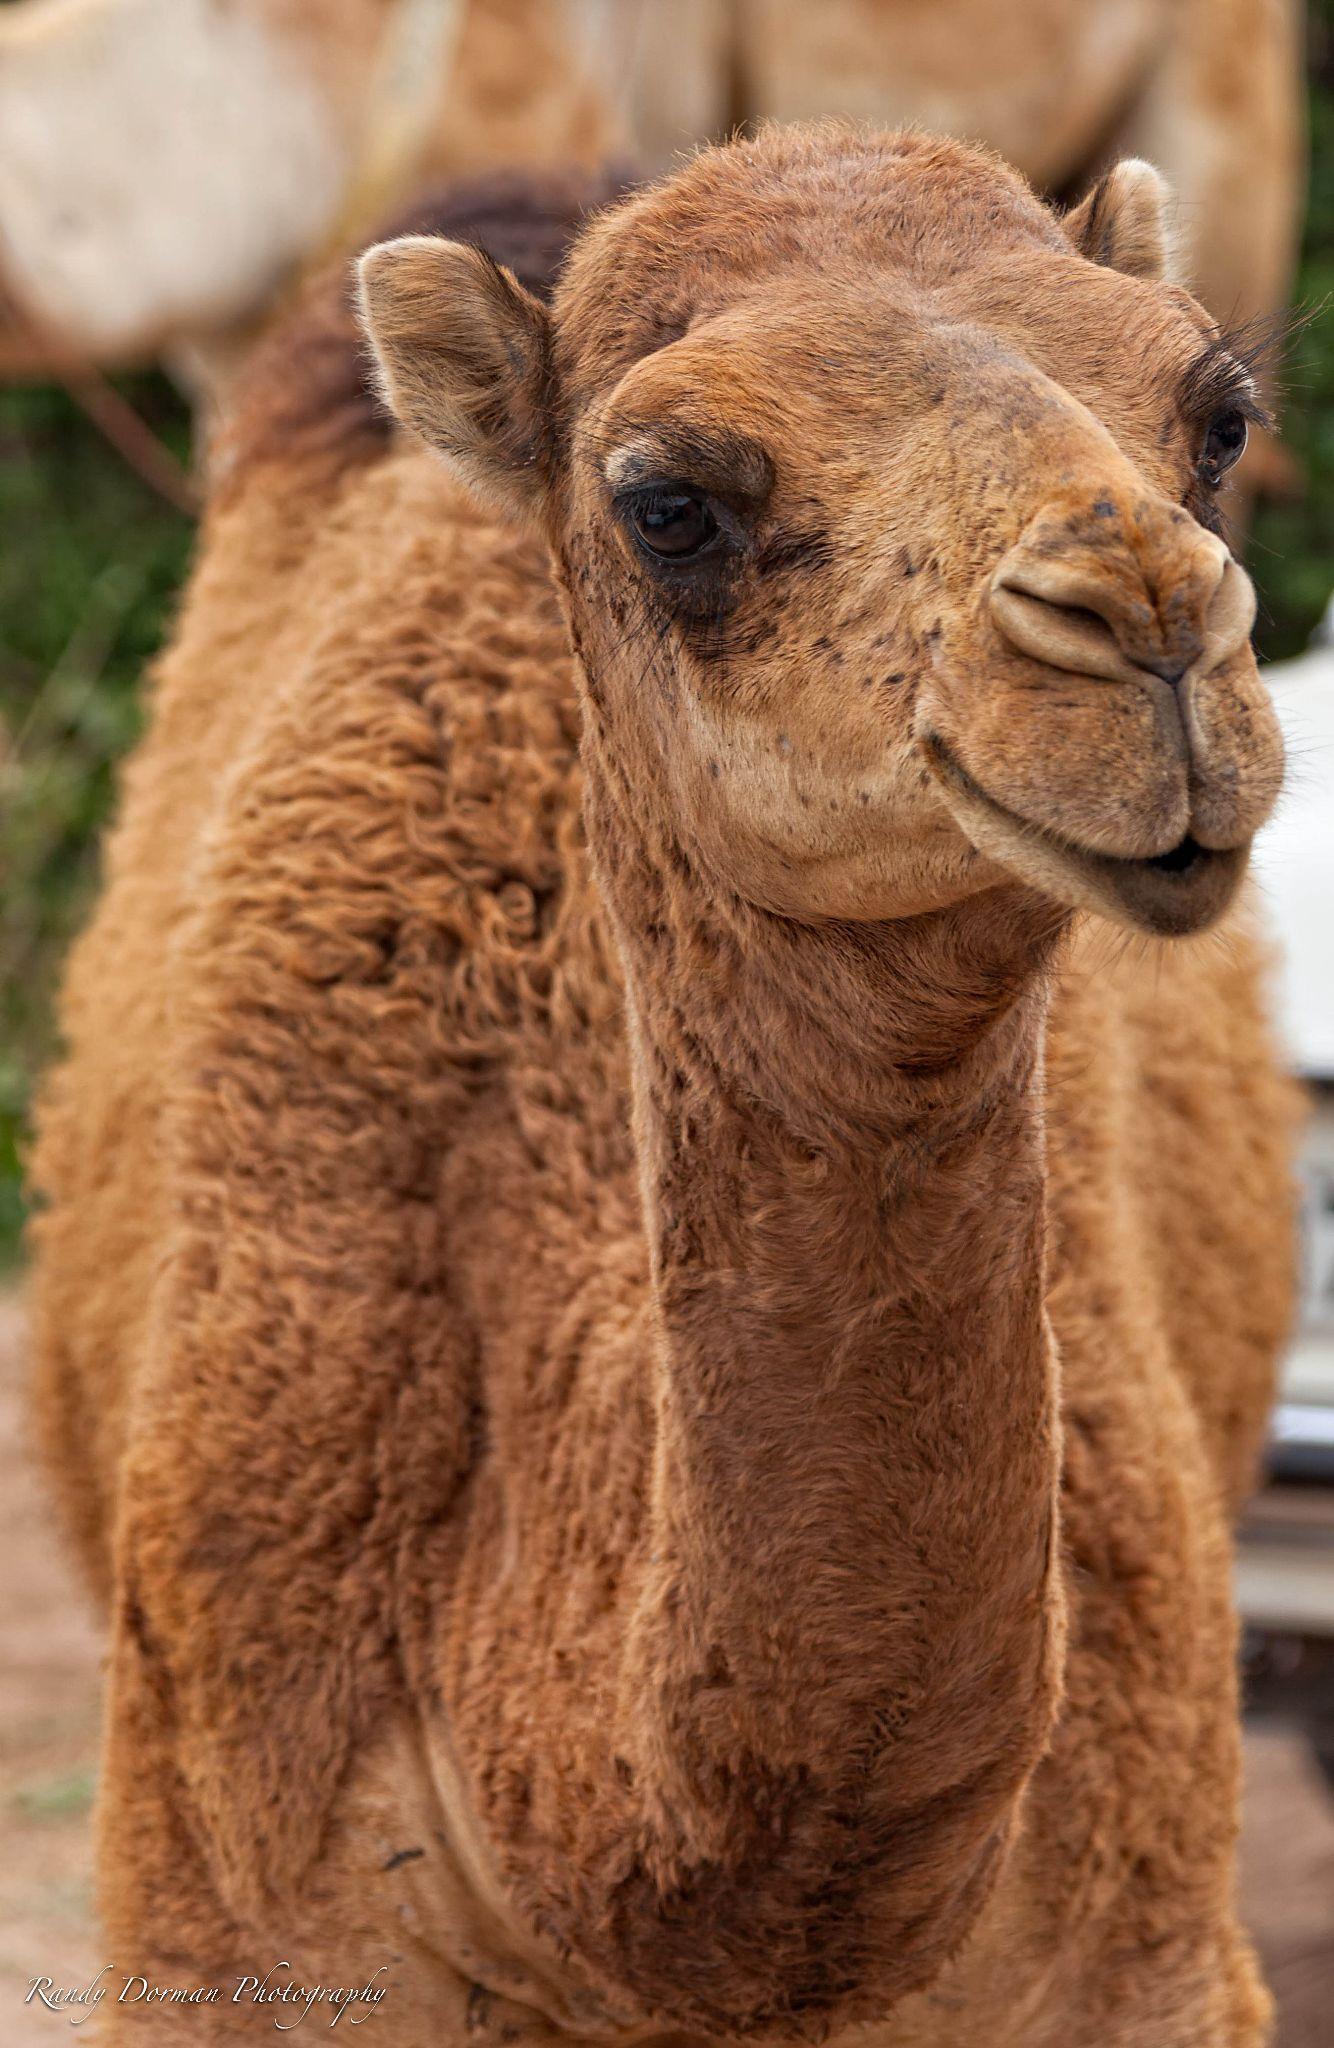 Baby Camel by Randy Dorman